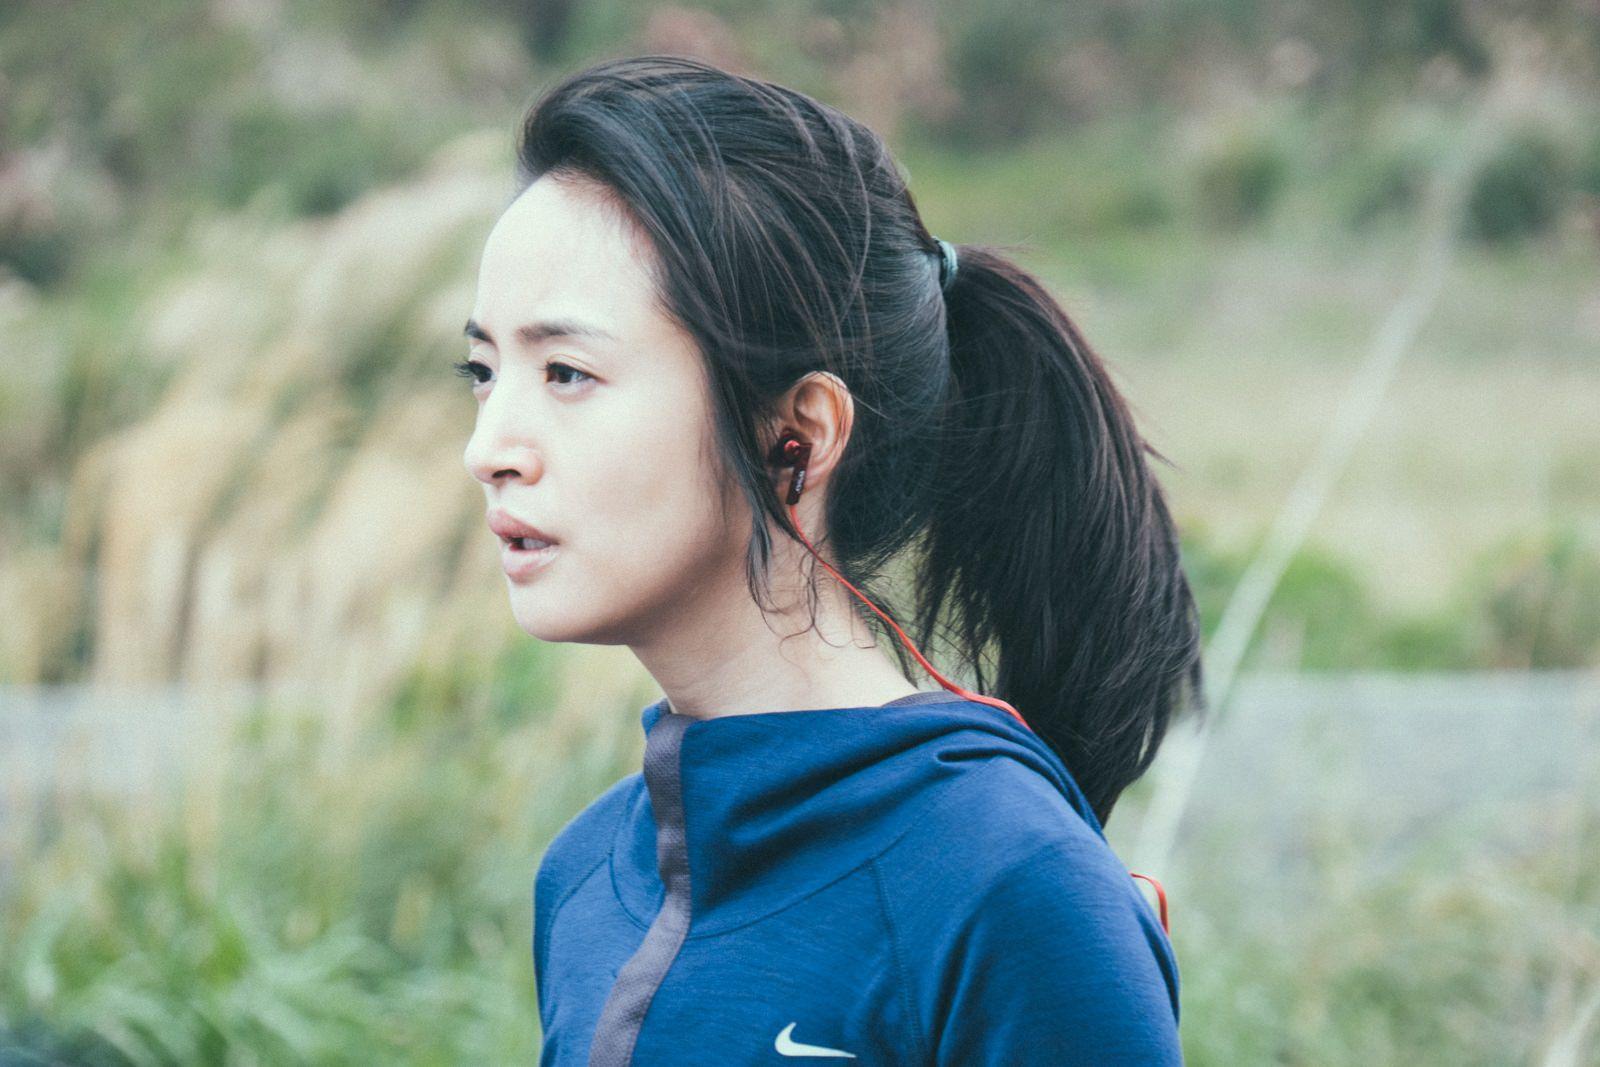 Movie, 神秘家族(中國, 2017年) / 神秘家族(台灣) / The Mysterious Family(英文), 電影角色與演員介紹